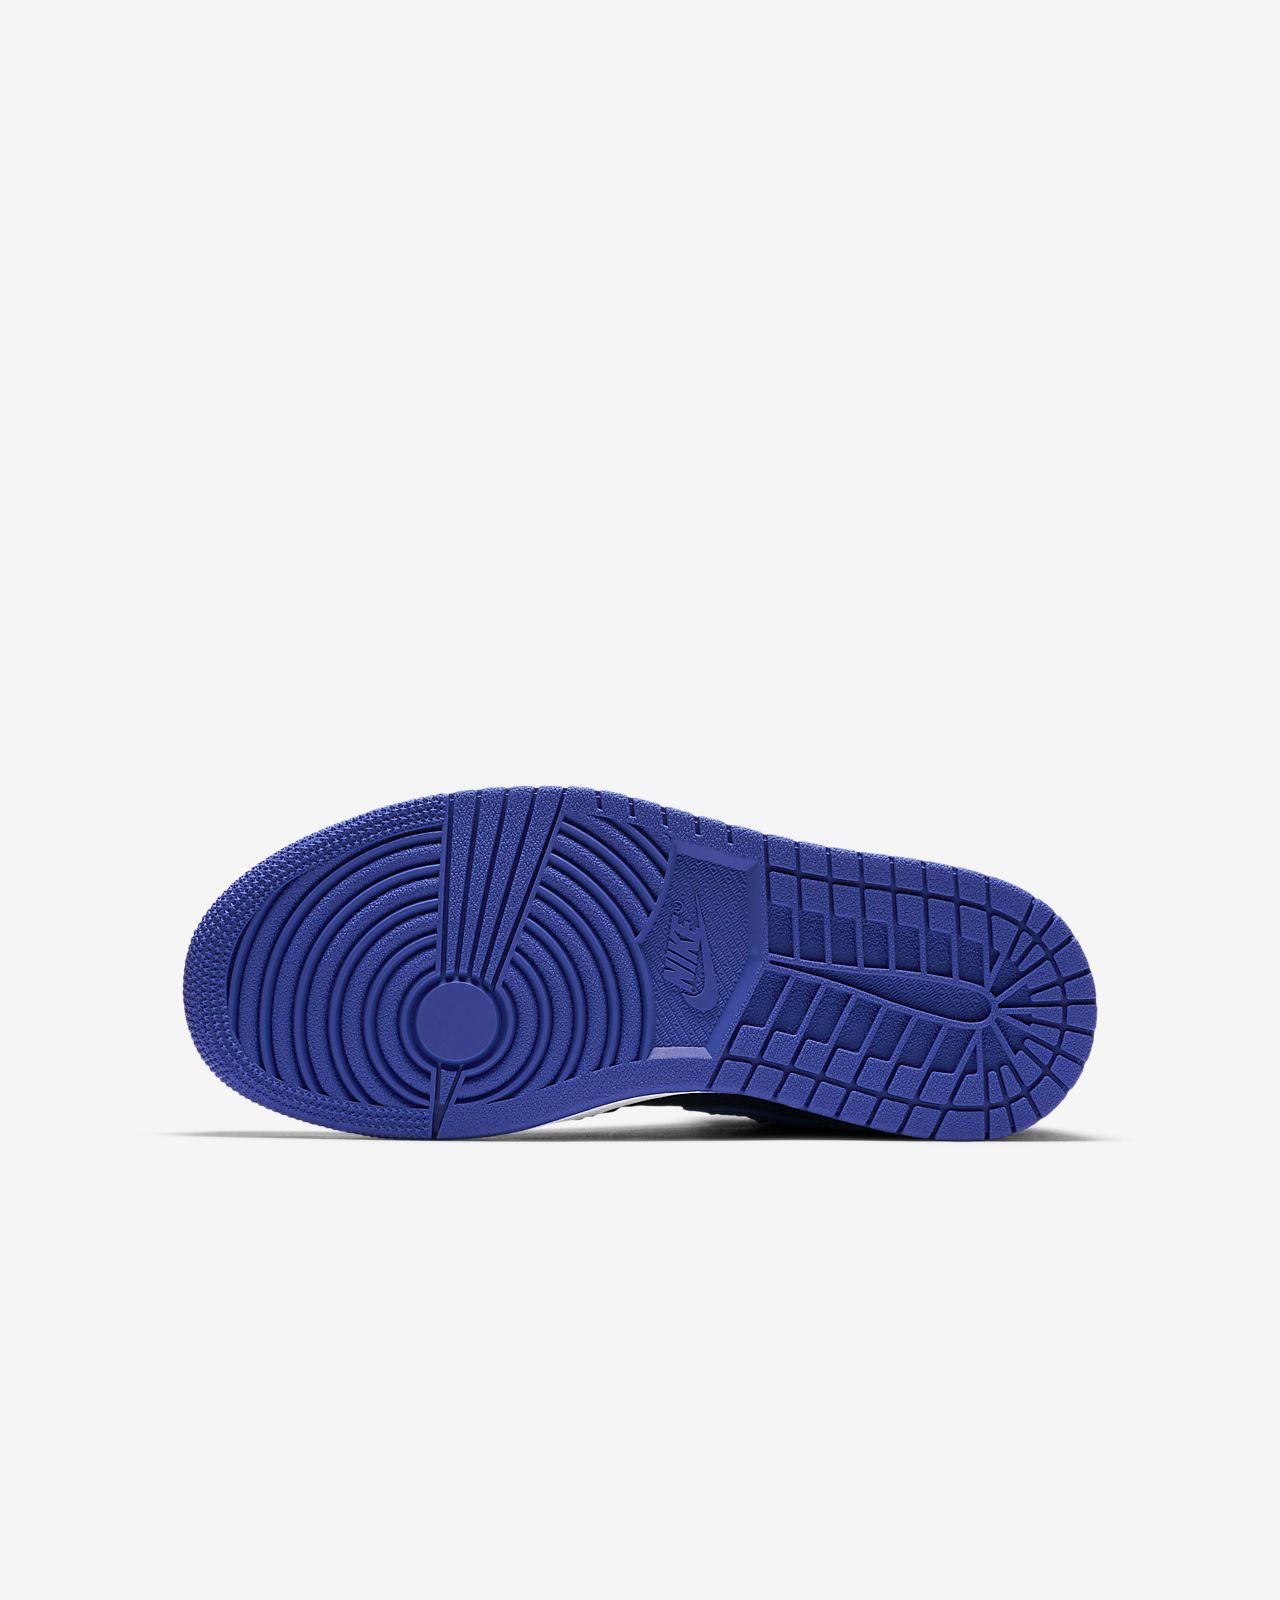 5d8487088 Air Jordan 1 Retro High Flyknit Older Kids  Shoe. Nike.com CA